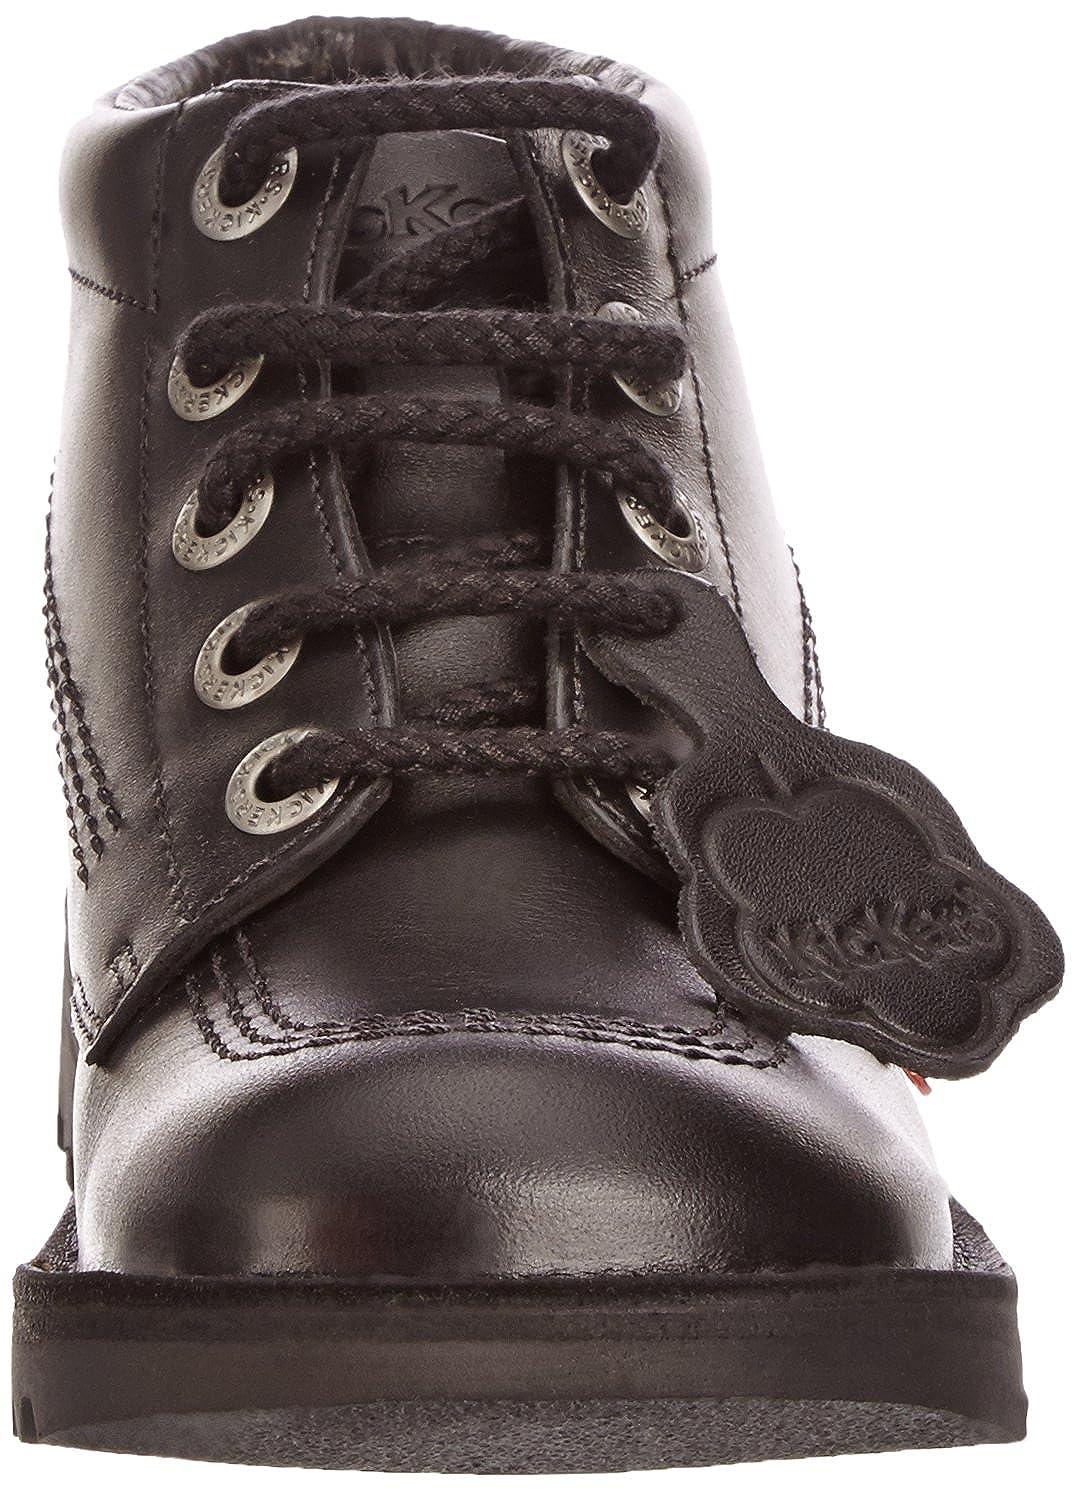 Kickers Kick Hi - Black Leather 8 Mens Boots UK 8 Leather / EU 42|Black B001BMVV8G 5756ca